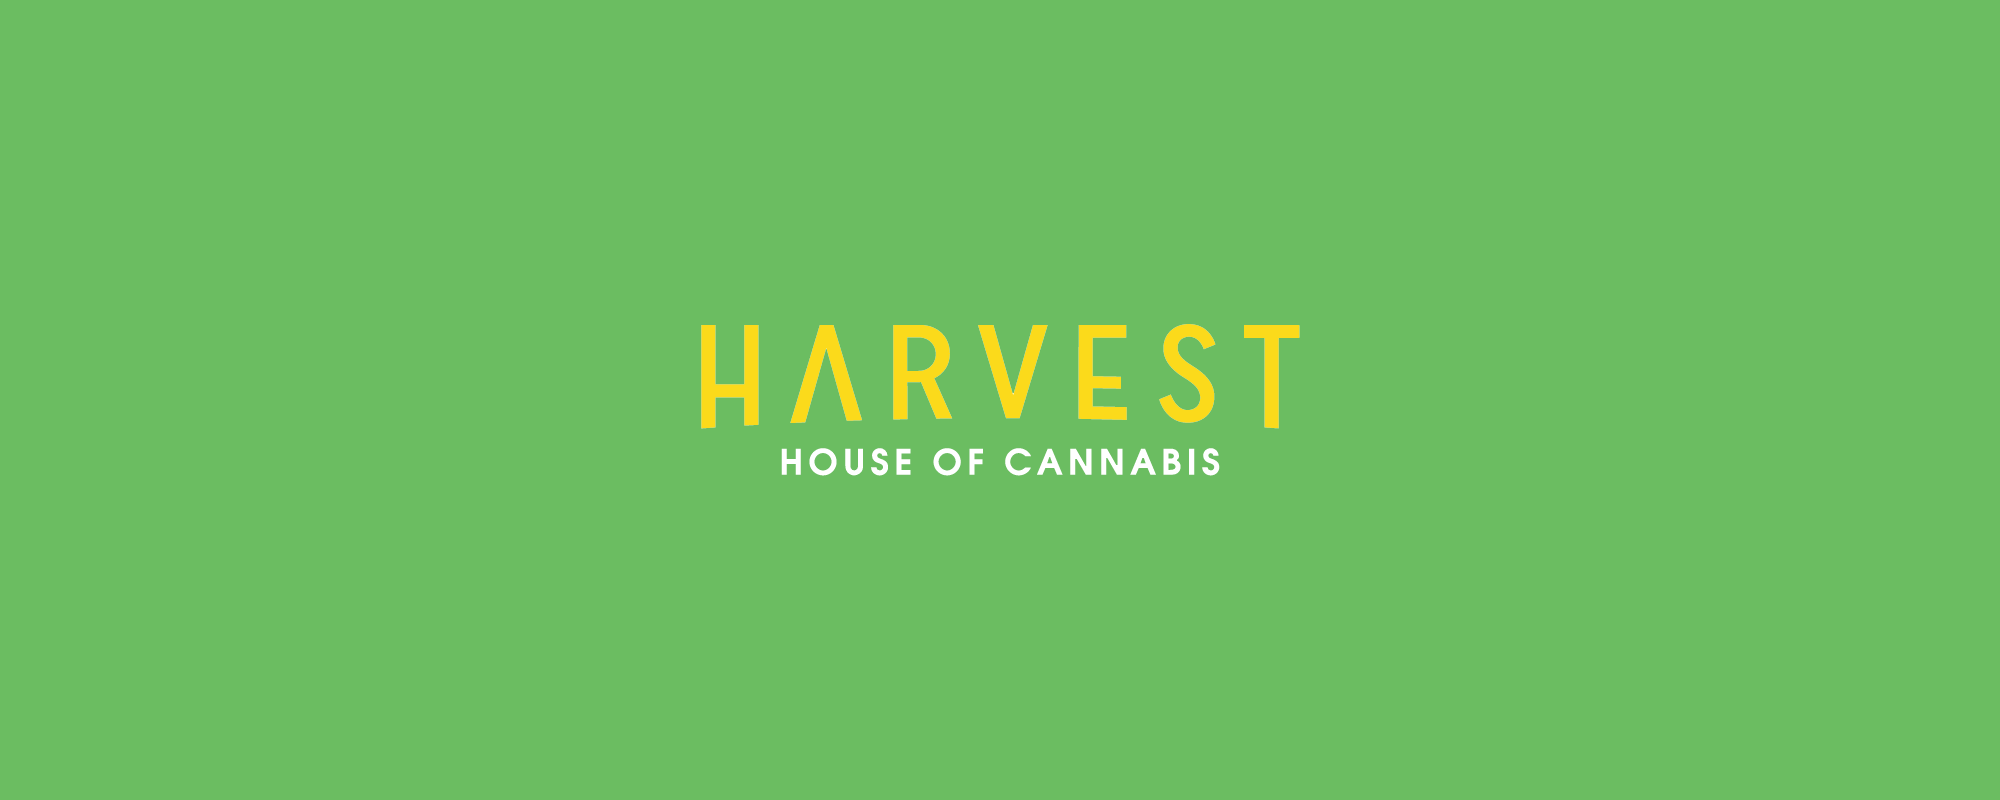 Harvest HRVSF